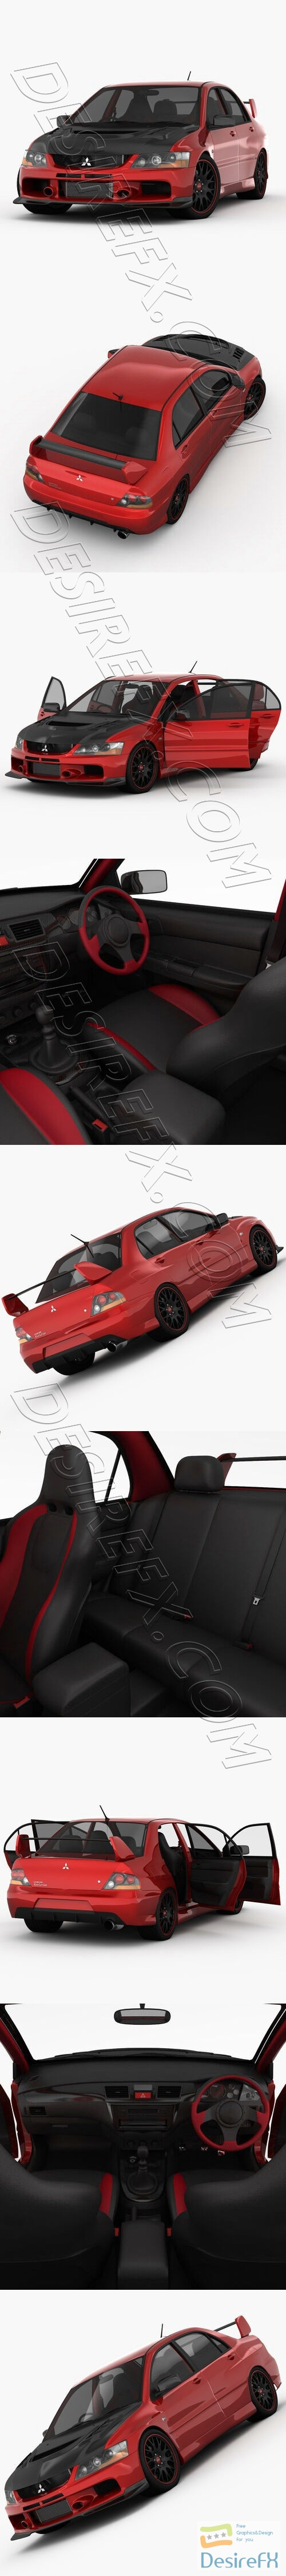 Mitsubishi Lancer Evo 9 Carbon 2007 3D Model